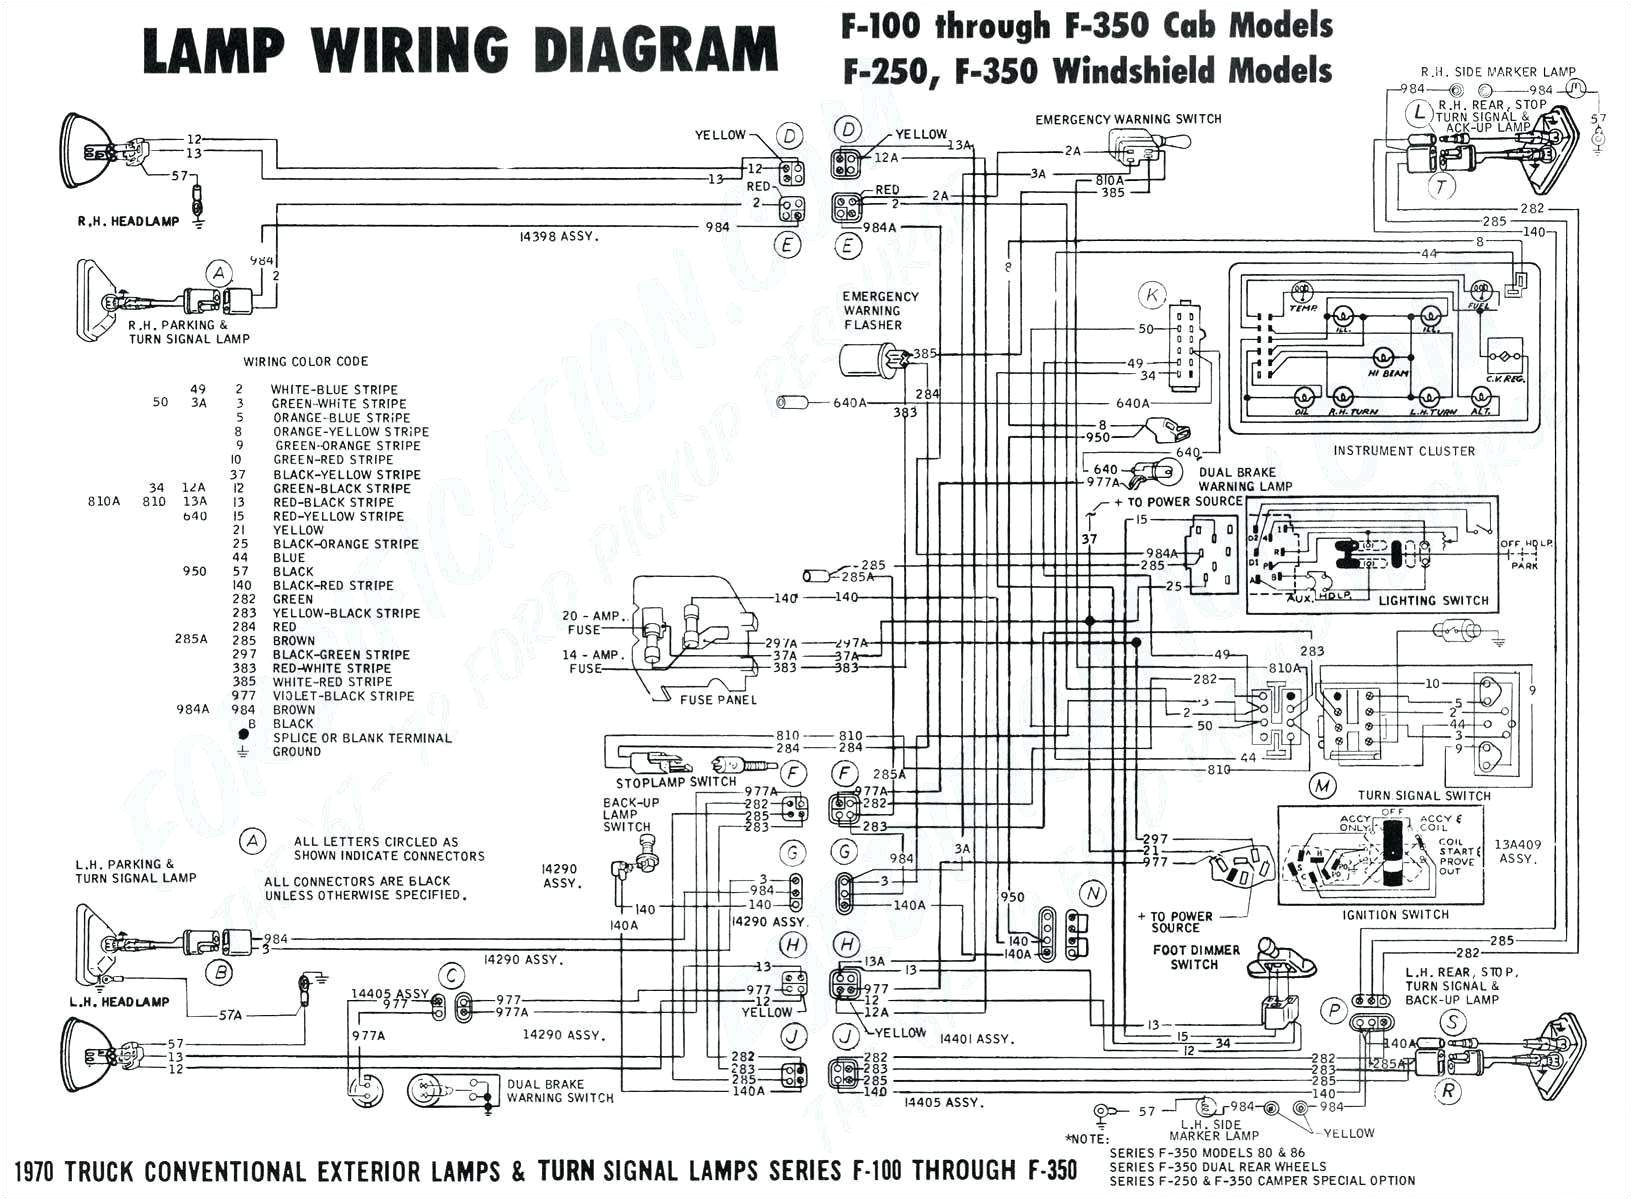 wiring diagram as well dodge ram 1500 on 2002 dodge ram 1500 power wiring 2 12 volt batteries in series diagram also 2002 dodge ram 1500